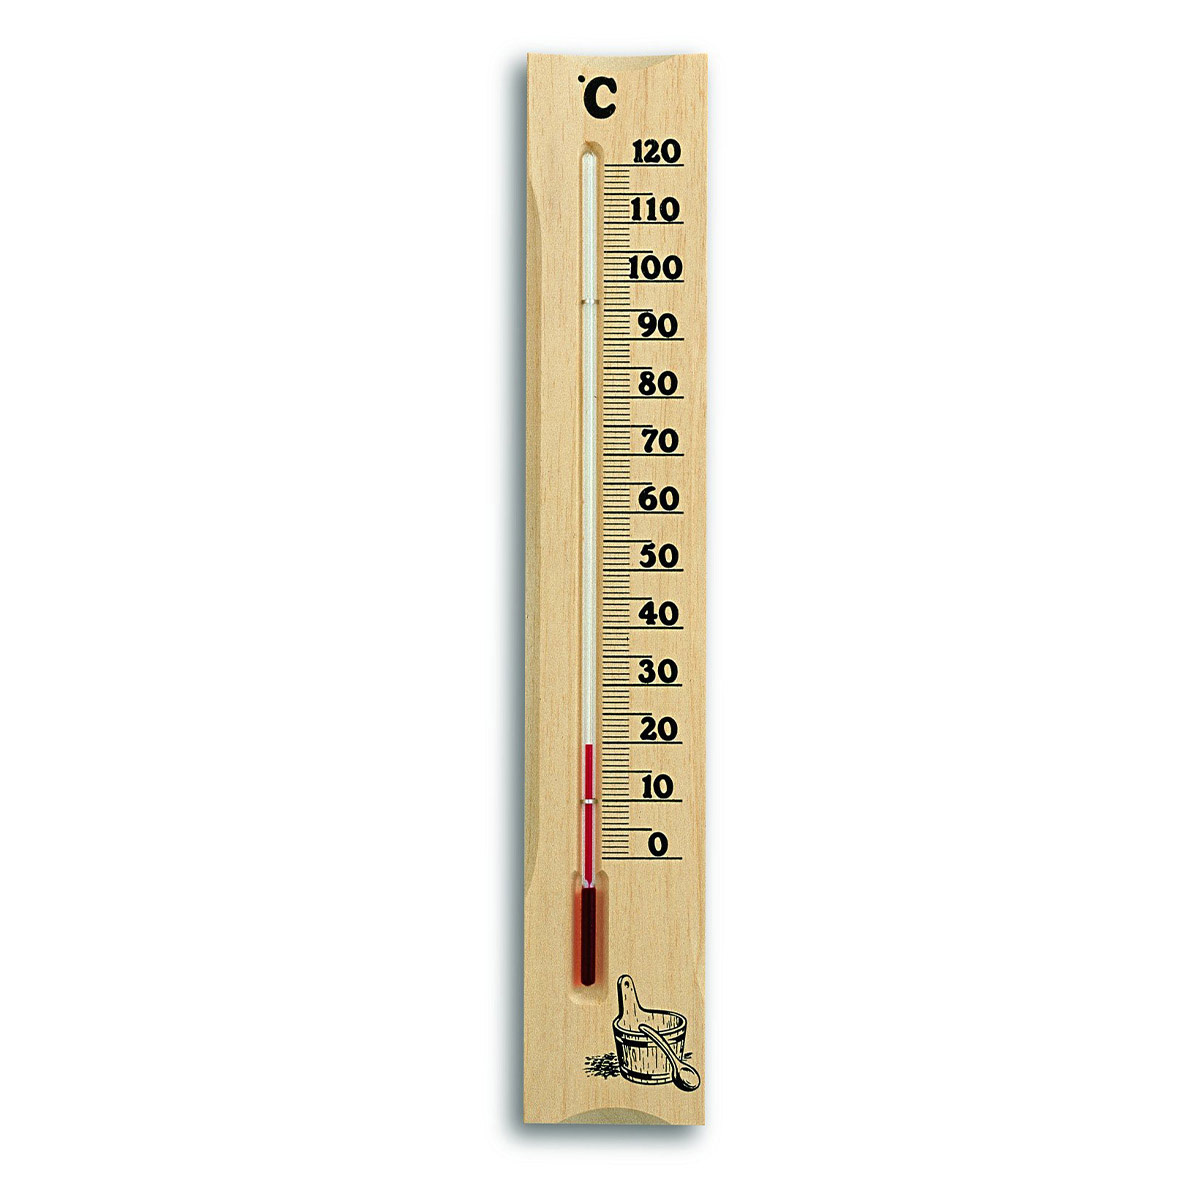 40-1000-analoges-sauna-thermometer-kiefer-1200x1200px.jpg